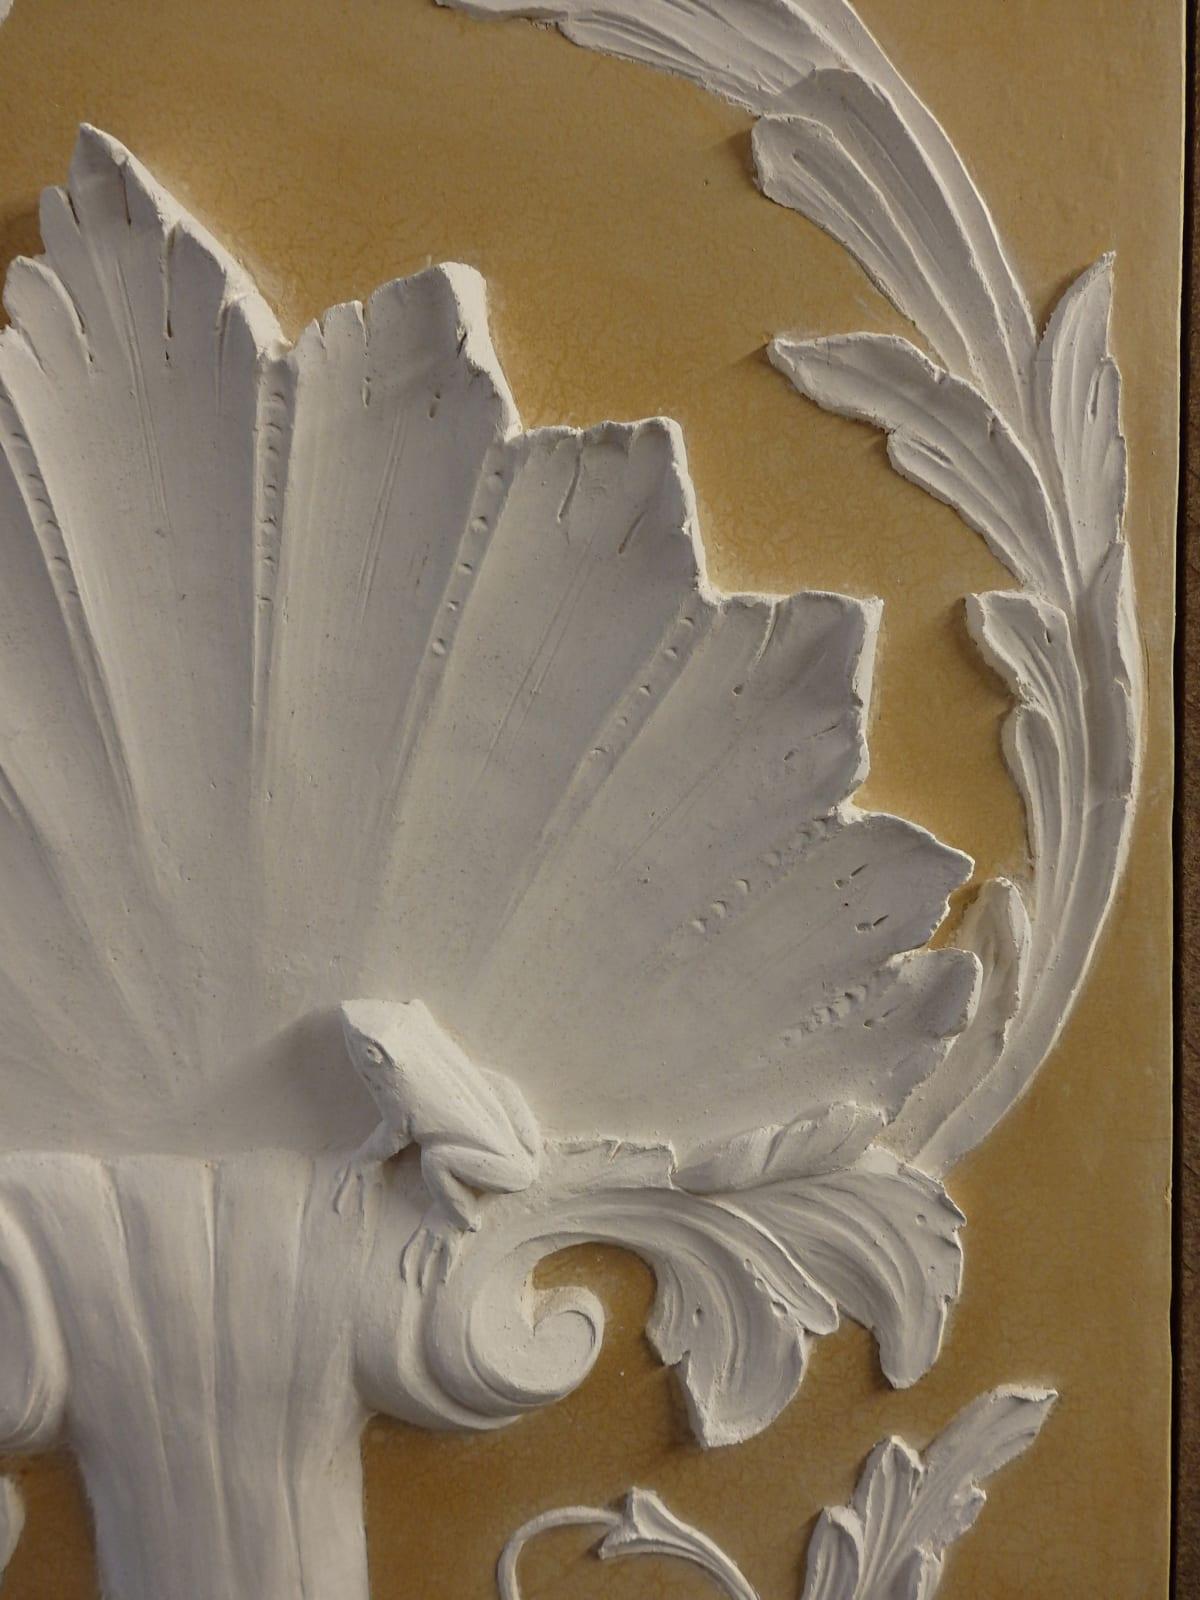 bas-relief-sculpture-marmorino-frog-pigmentti